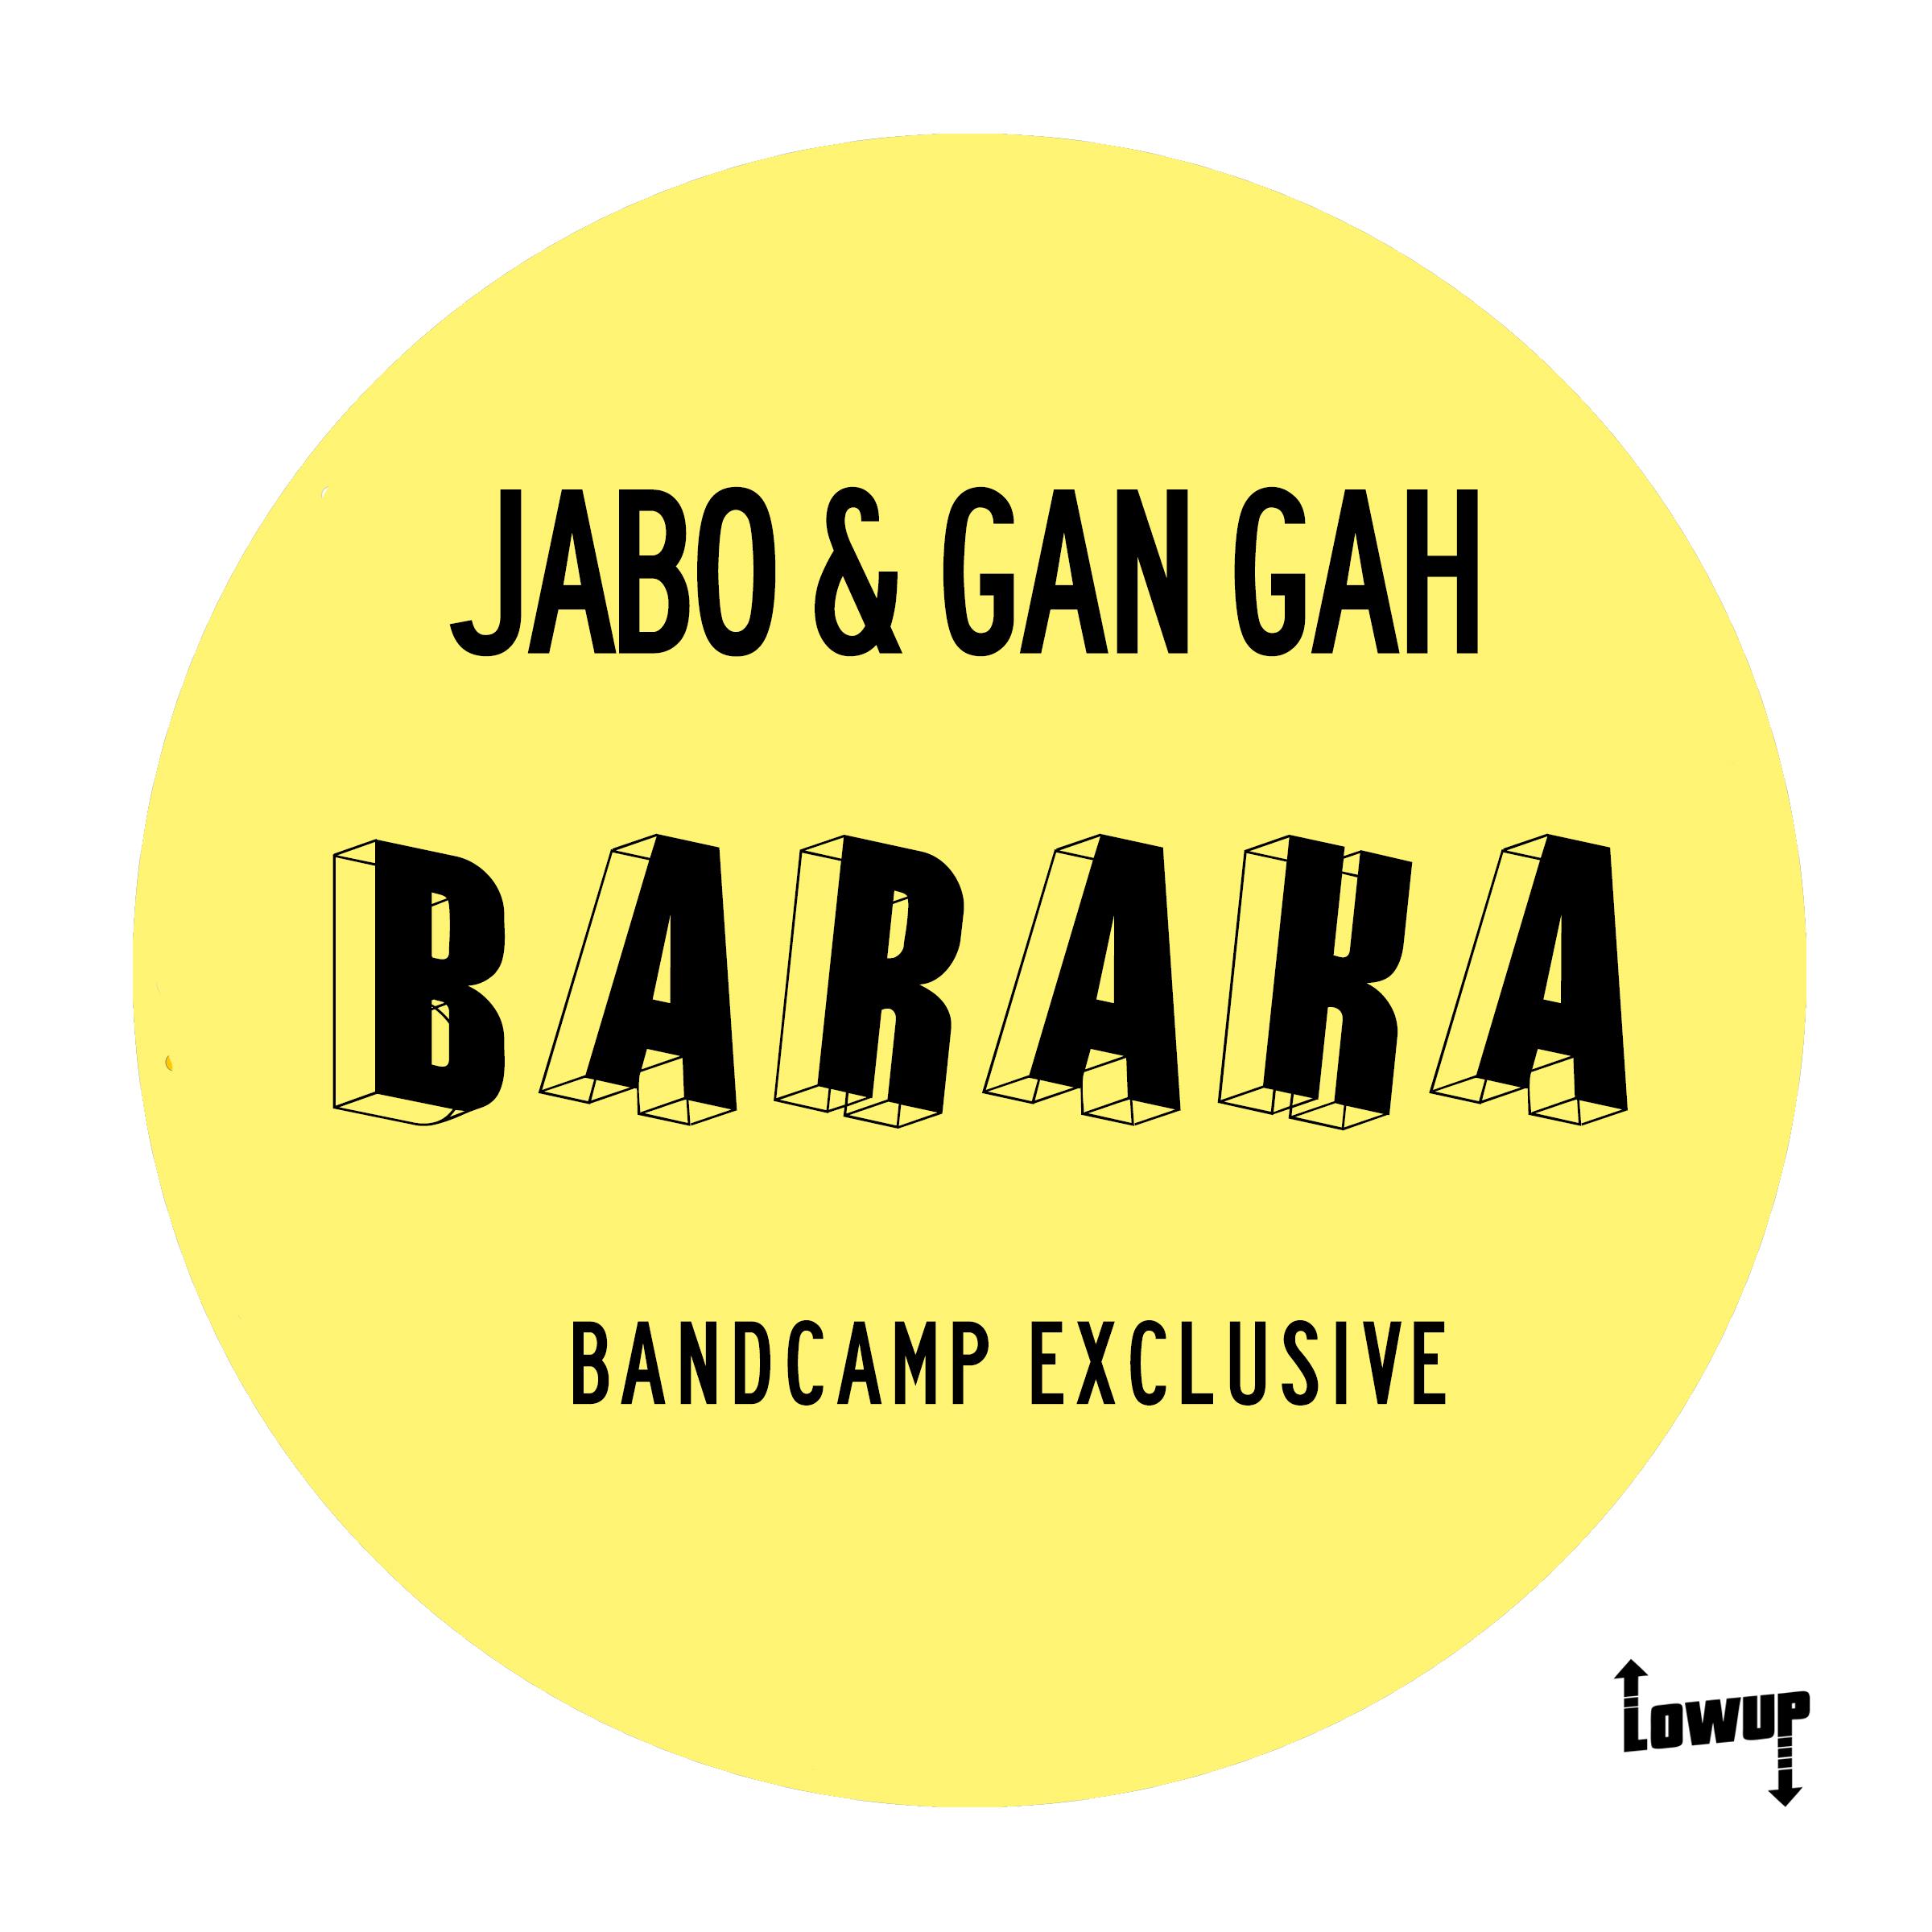 Jabo & Gan Gah – Baraka (Bandcamp Exclusive)